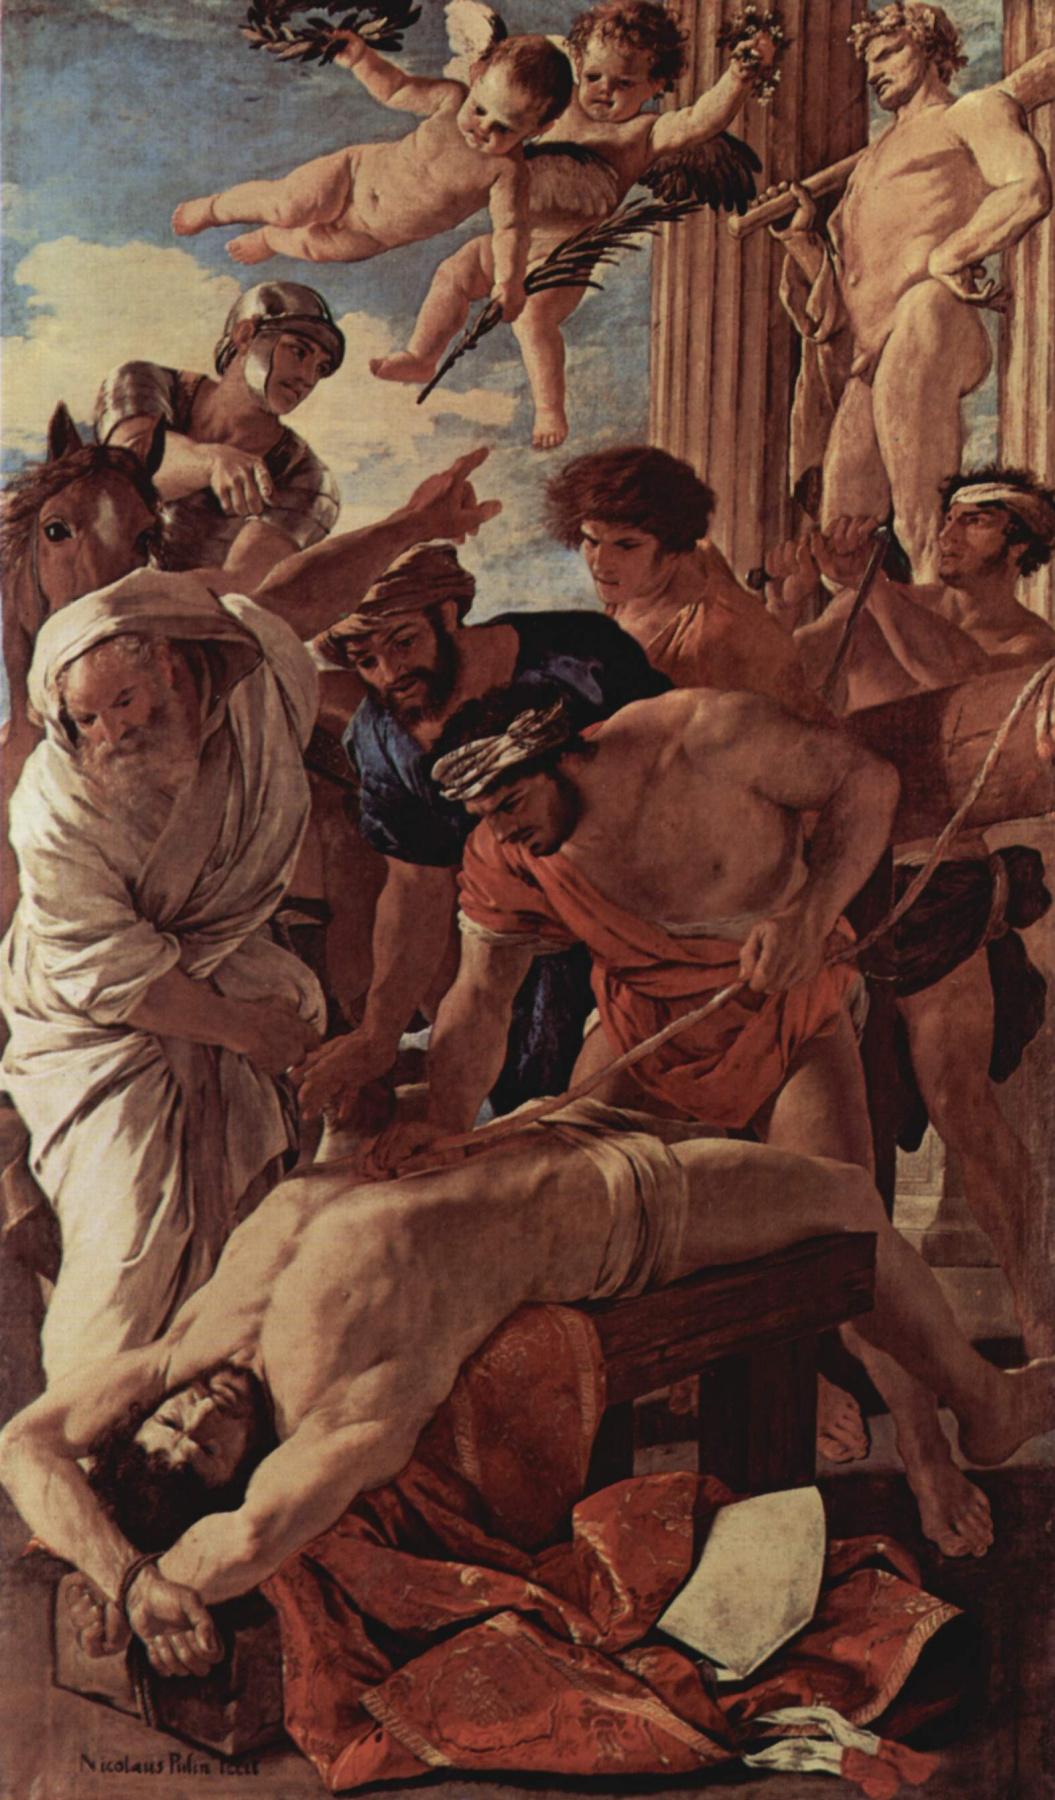 Nicolas Poussin. The martyrdom of St. Erasmus